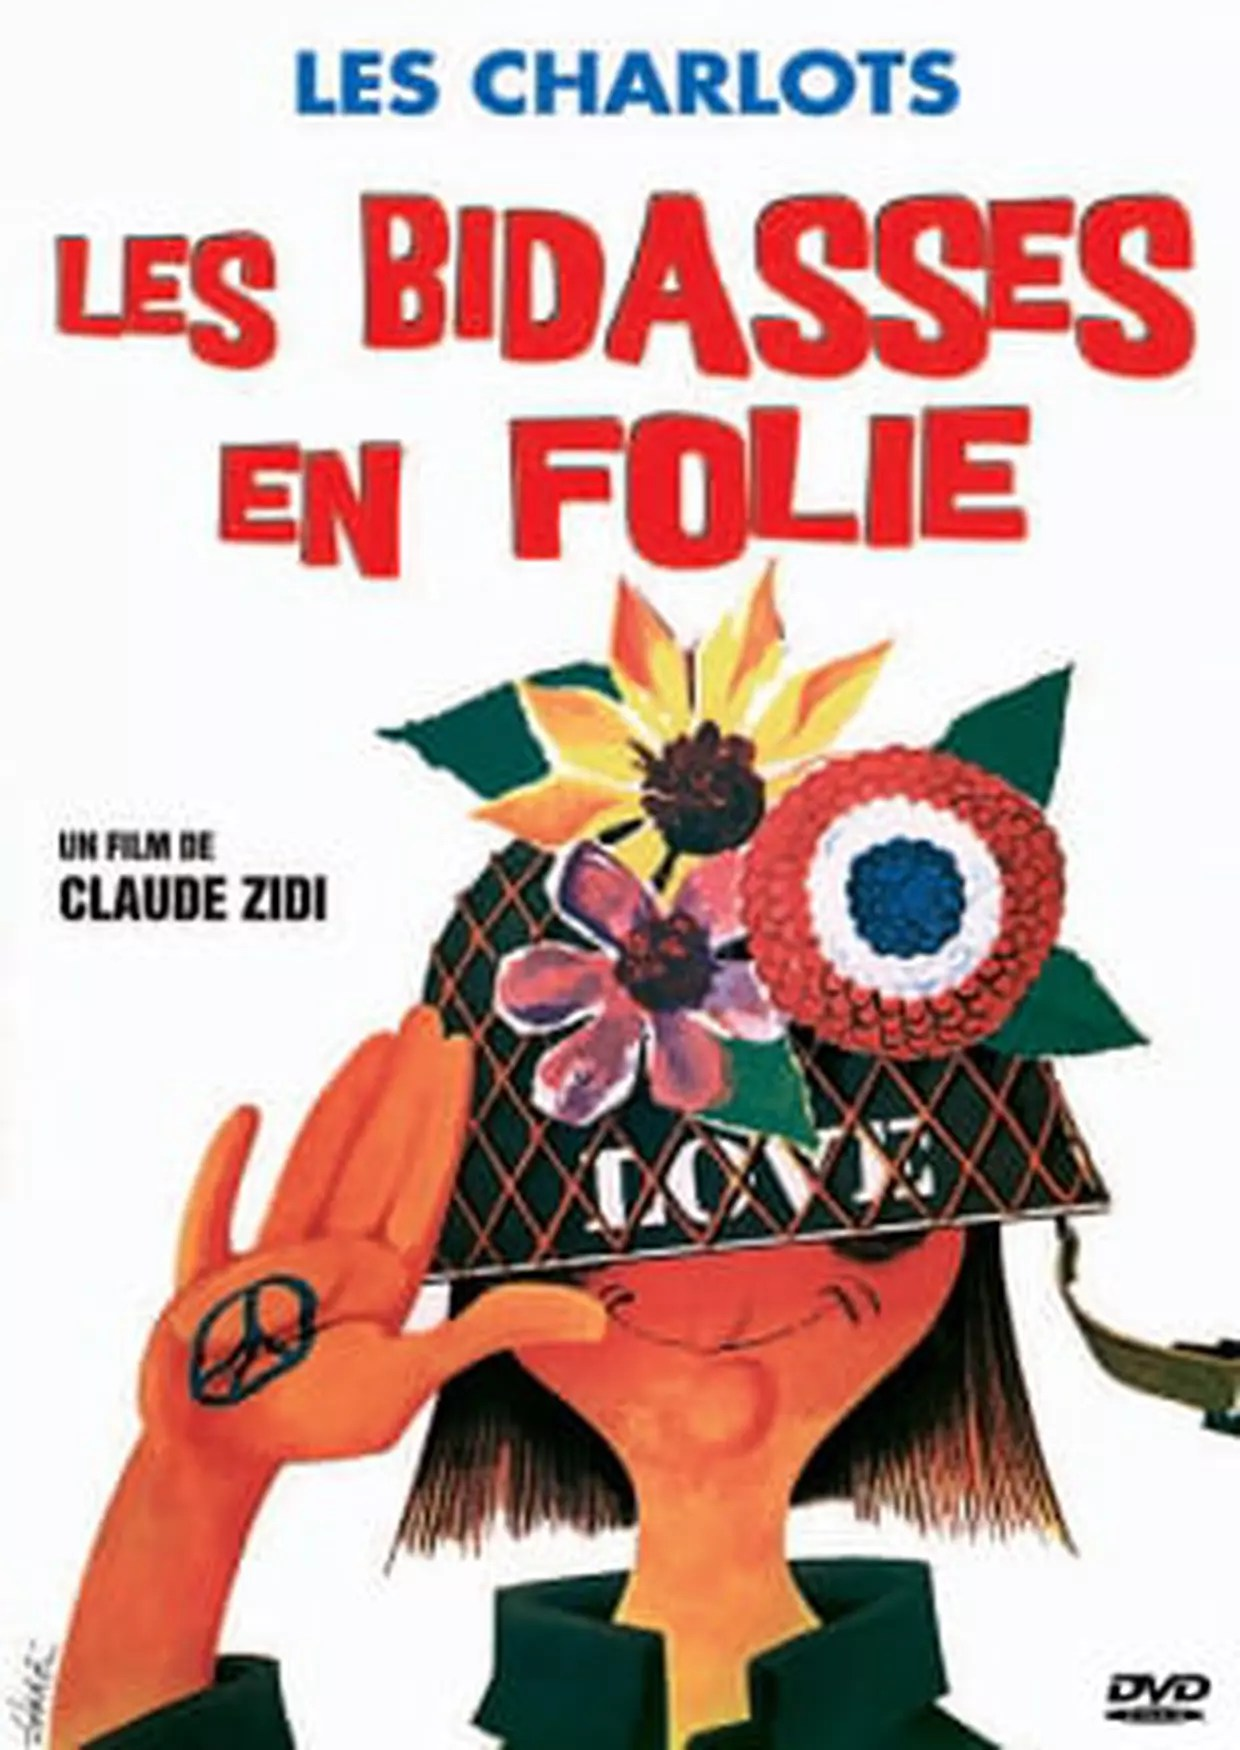 Les Charlots Les Bidasses En Folie Streaming : charlots, bidasses, folie, streaming, Bidasses, Folie, Bande, Annonce, Film,, Séances,, Streaming,, Sortie,